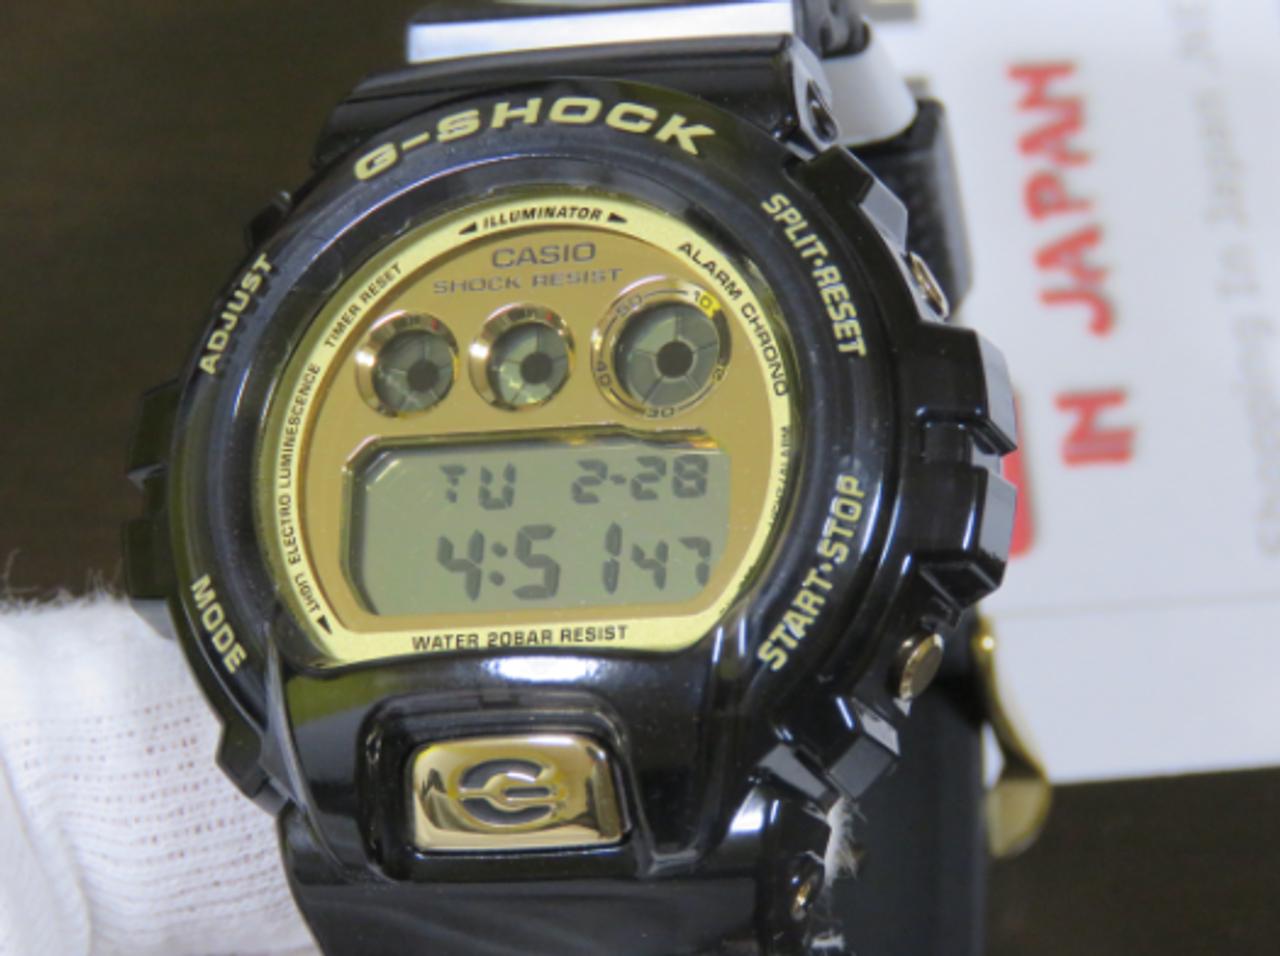 DW6930D-1